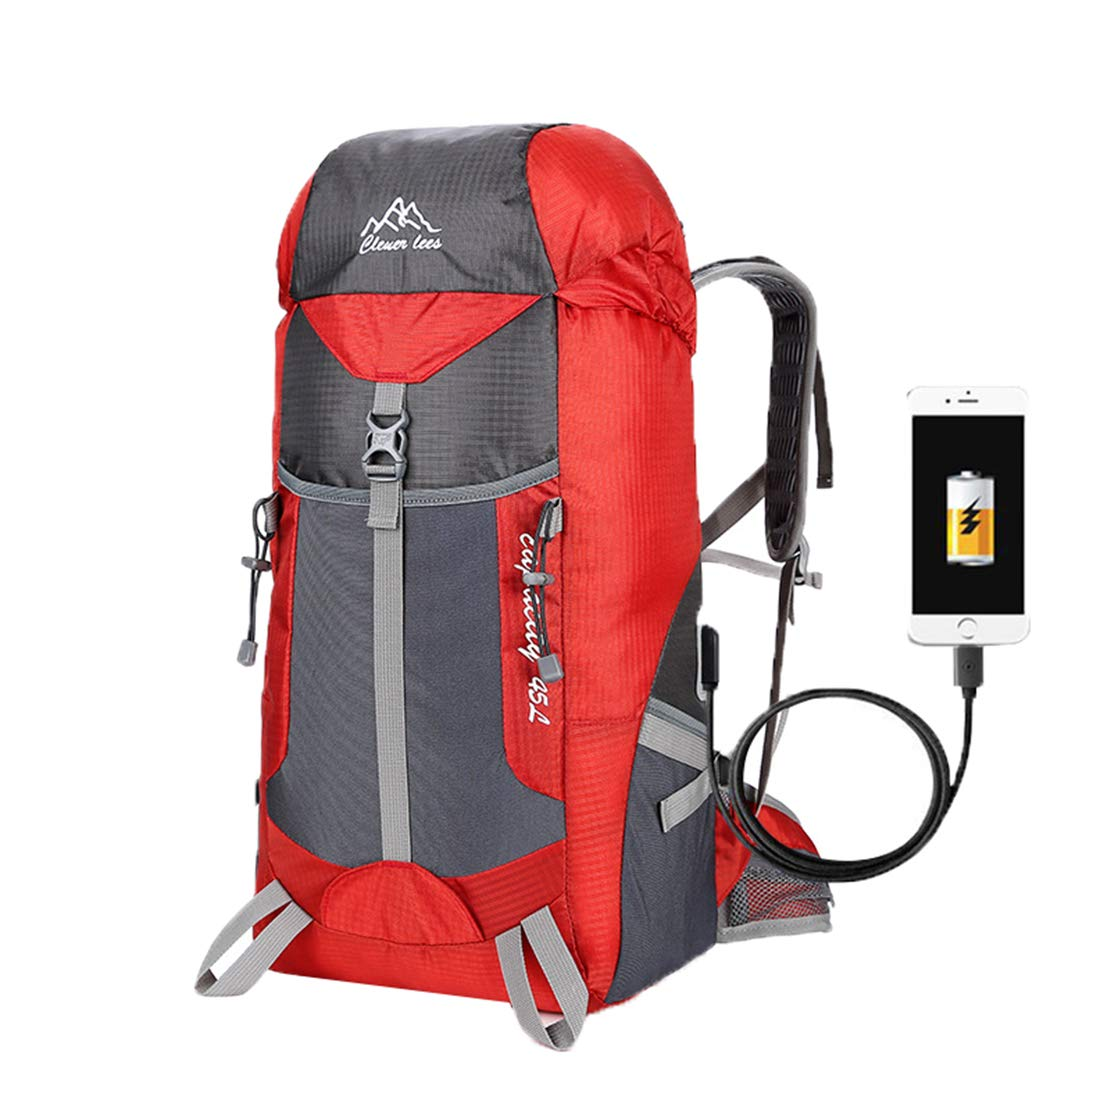 Pteng - Bolsa de Viaje Grande, Mochila de Senderismo, Mochila de Trekking con USB para Exteriores, Mochila Impermeable de Nailon, Negro, tamaño: Amazon.es: ...